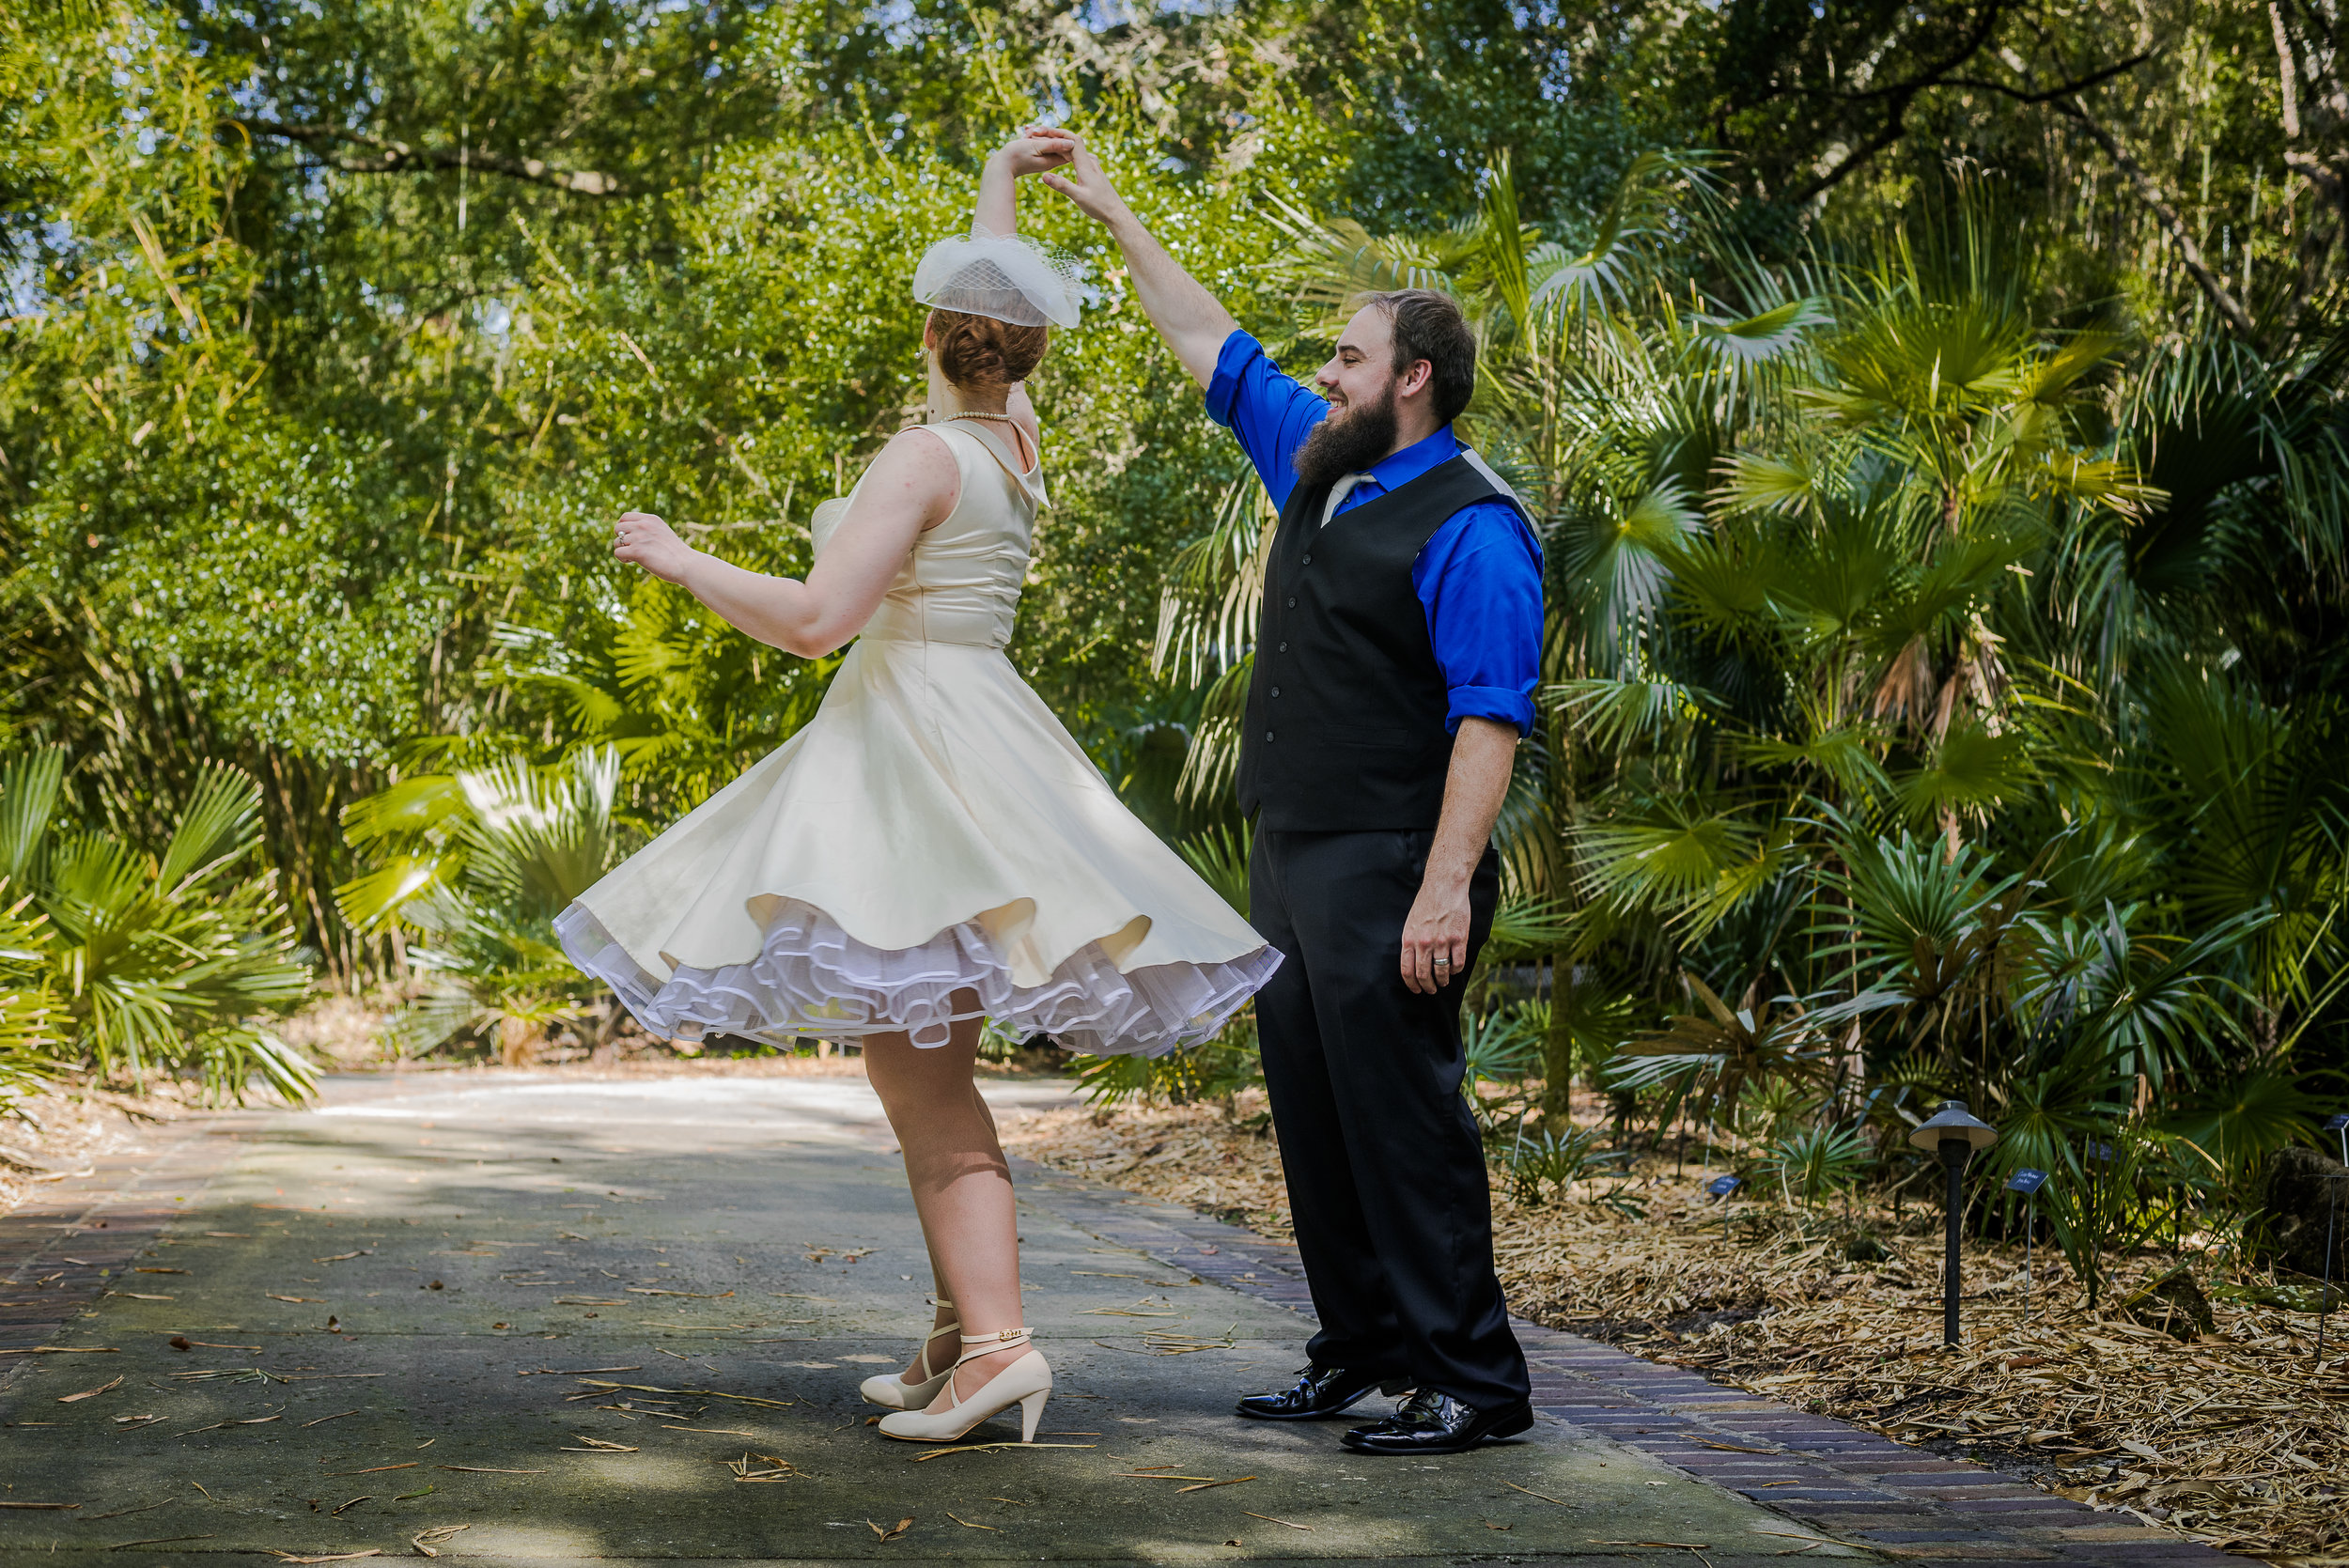 herry-garden-wedding-1-4.jpg